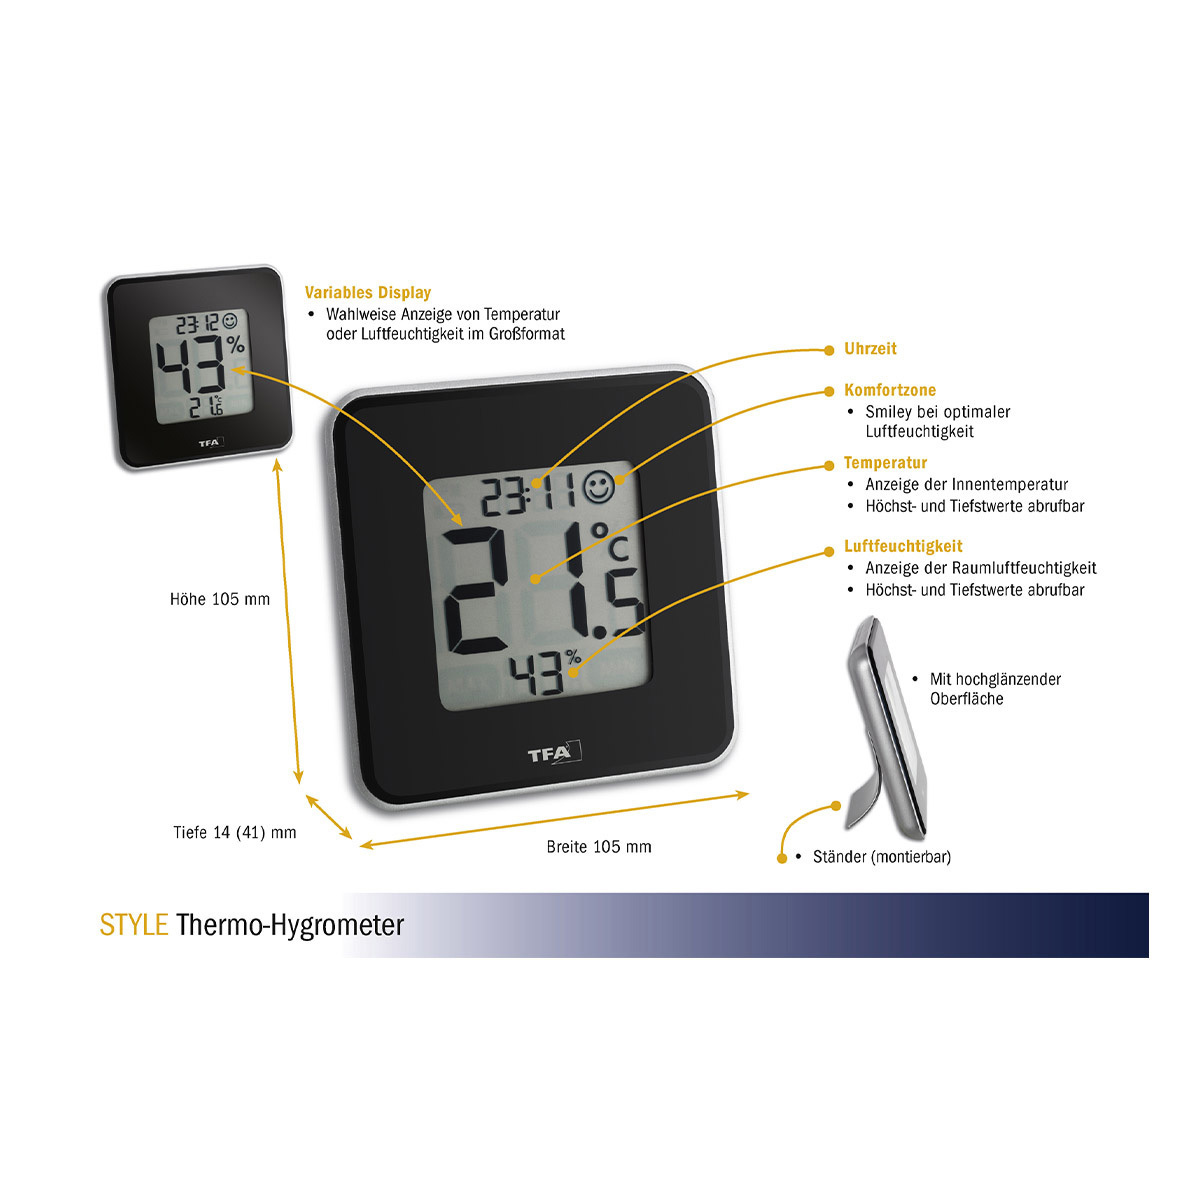 30-5021-01-digitales-thermo-hygrometer-style-abmessungen-1200x1200px.jpg